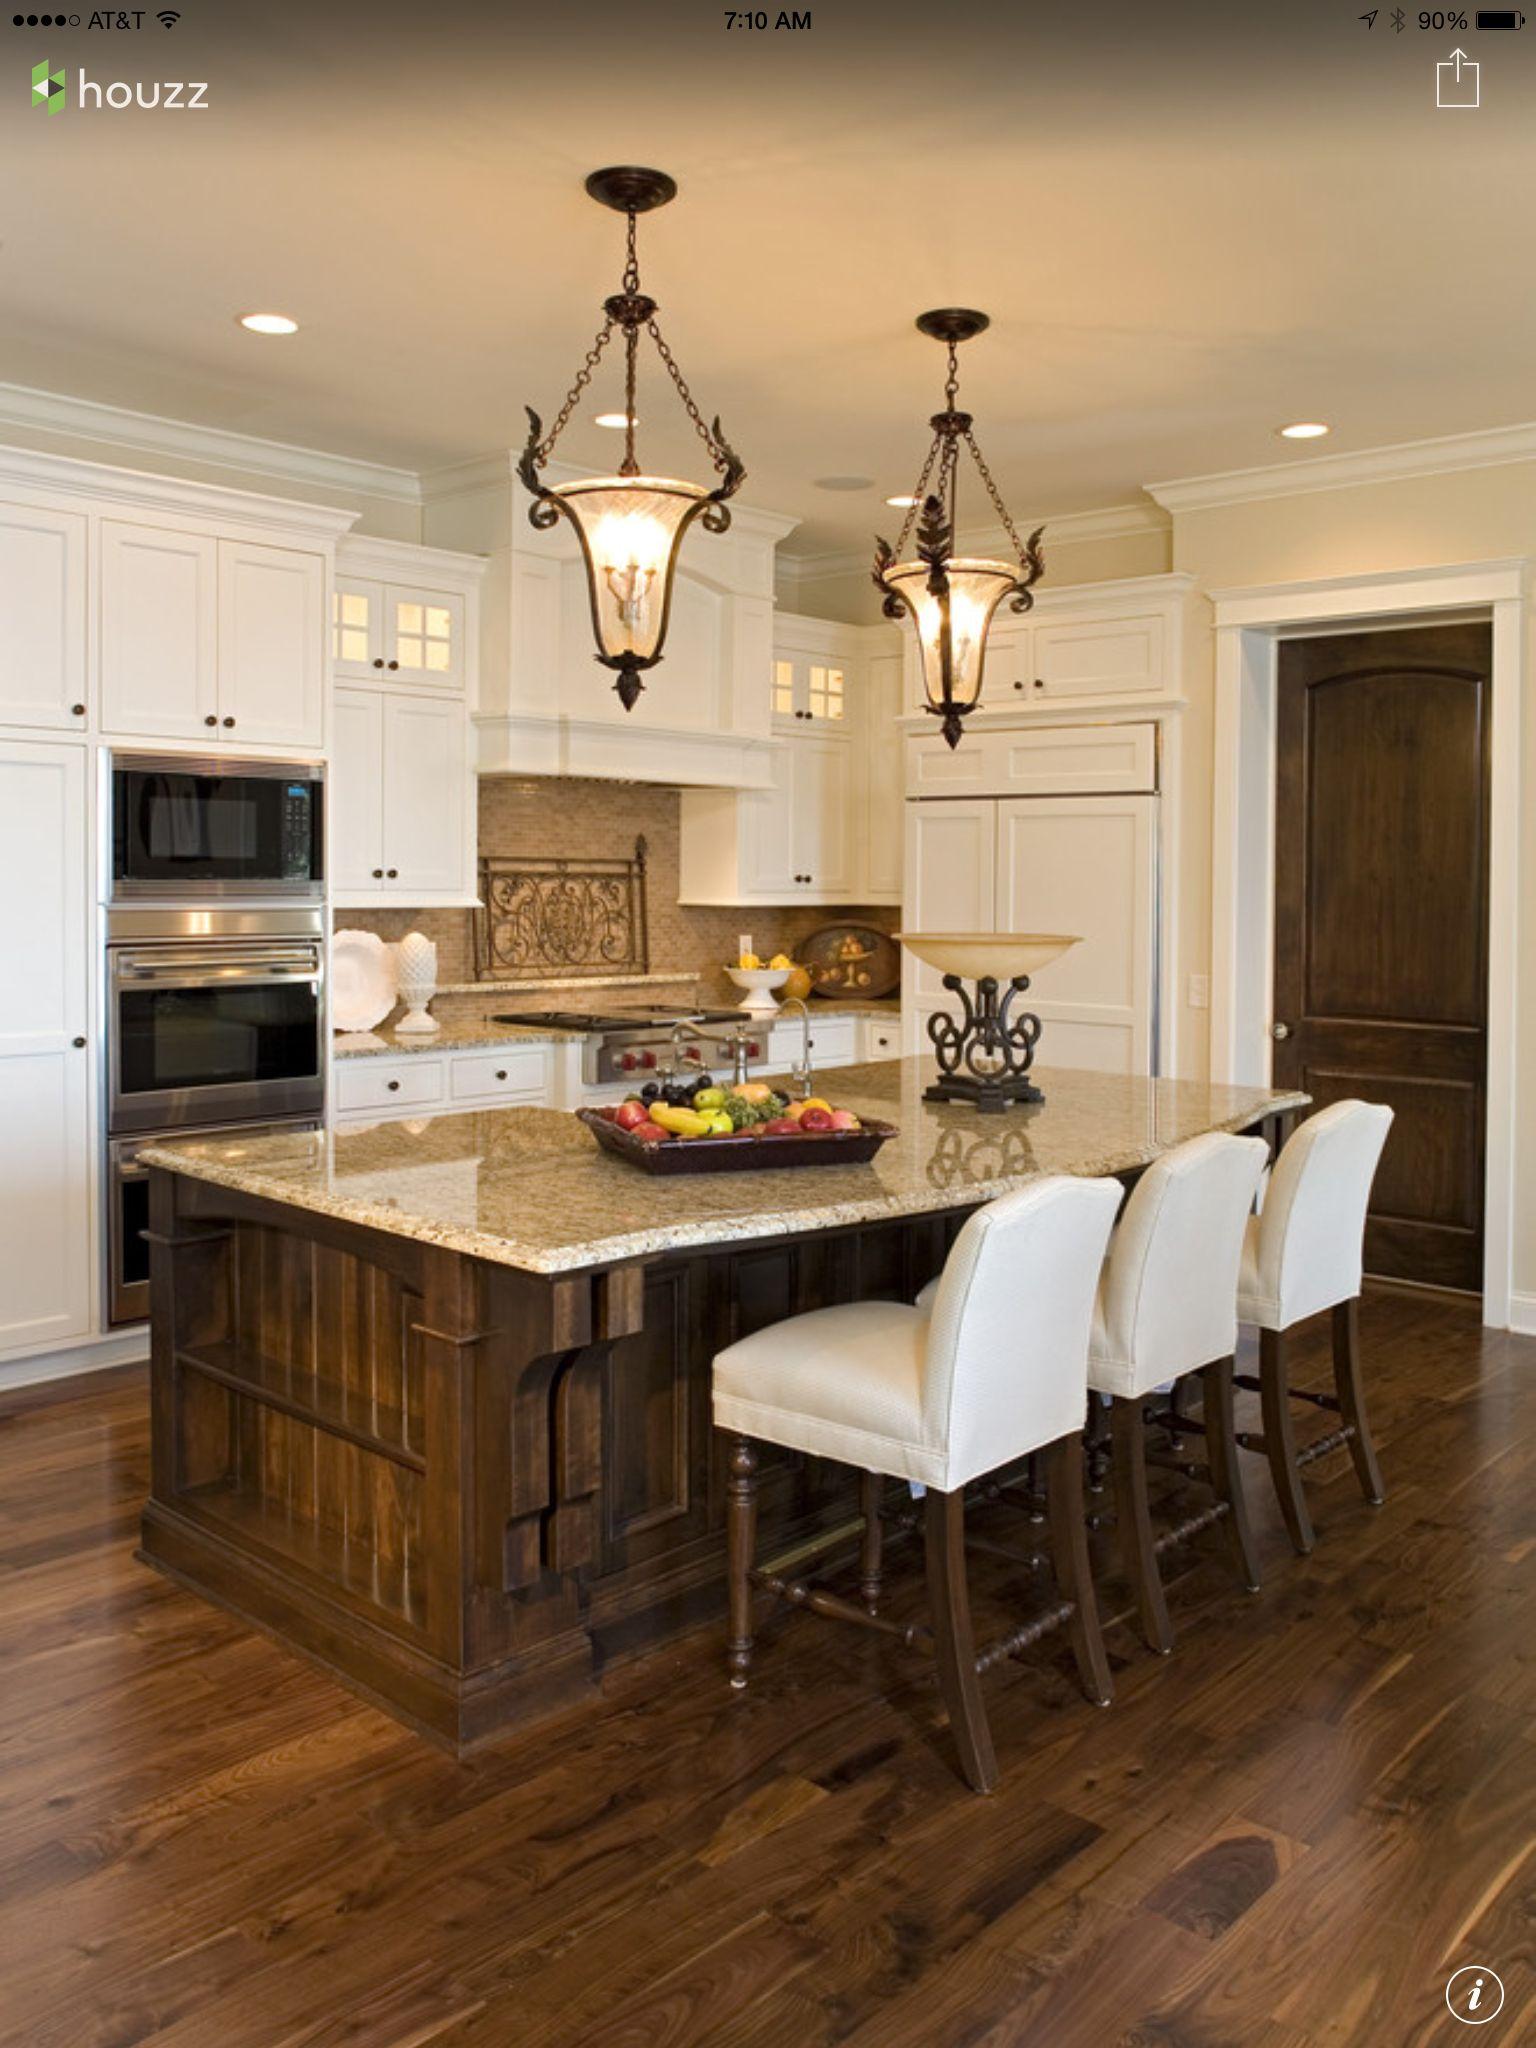 kitchen sinks houzz inexpensive countertops for kitchens stonewood llc pinterest